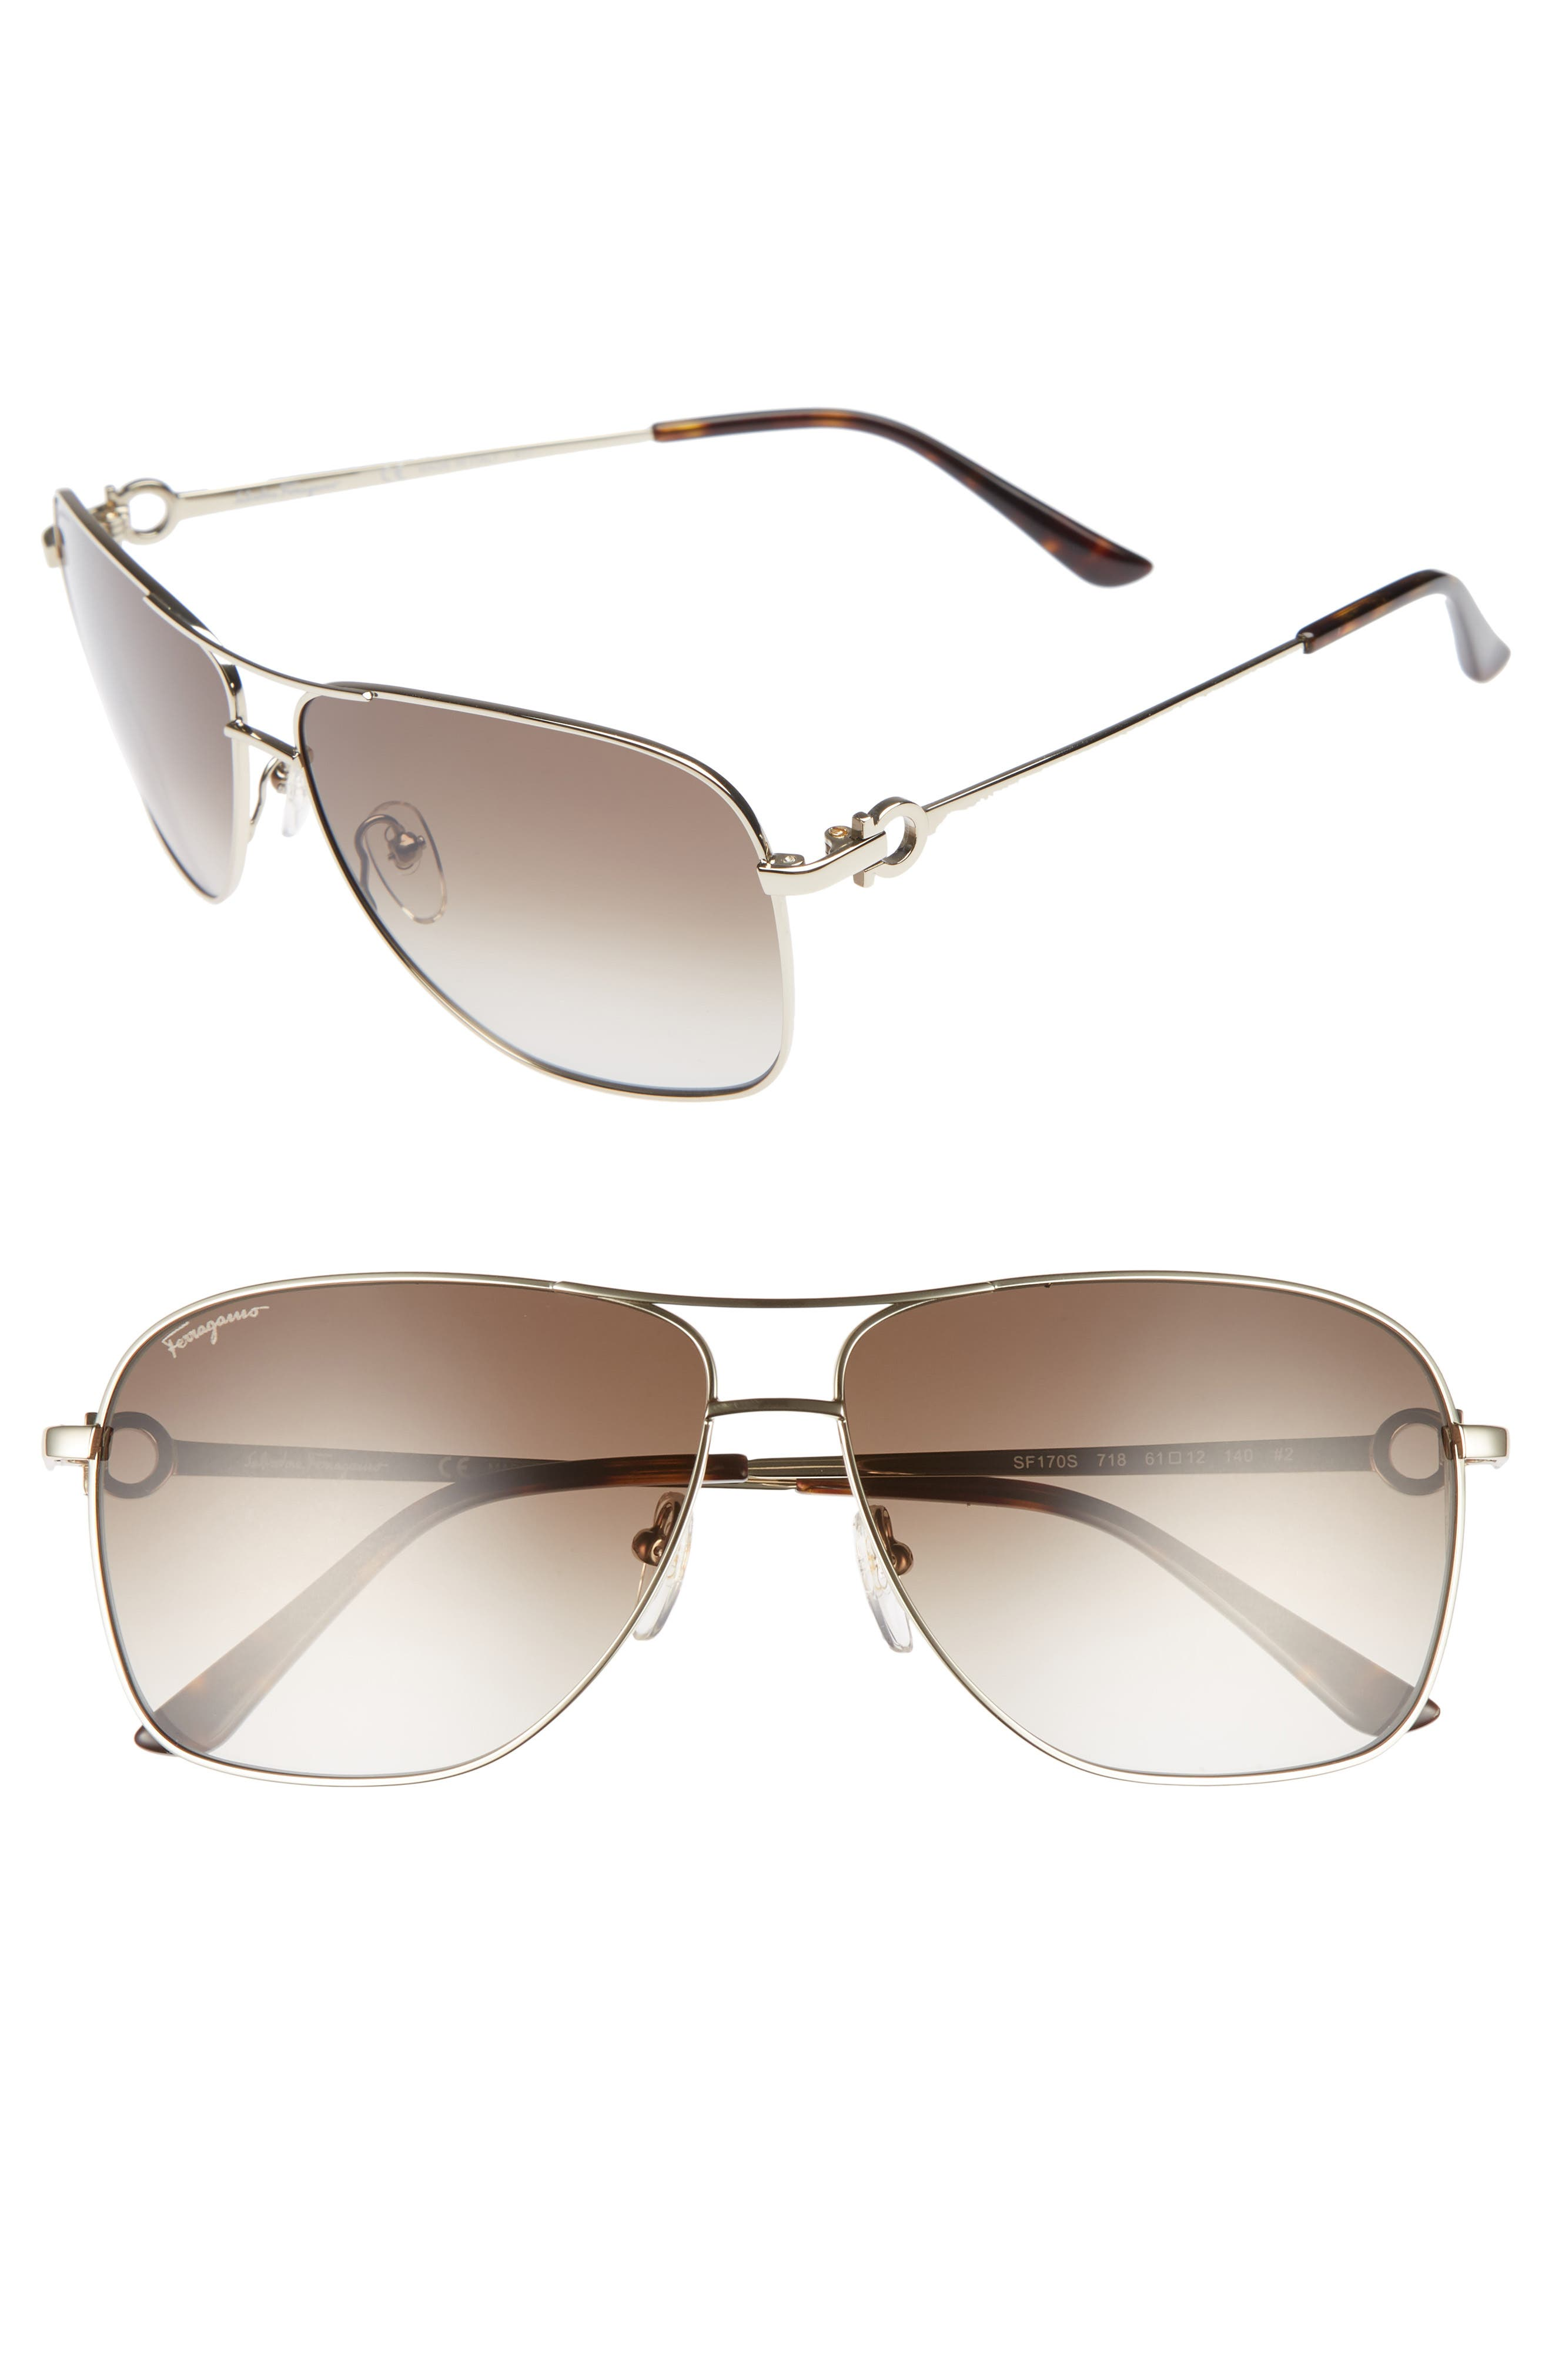 Gancio 61mm Aviator Sunglasses,                         Main,                         color, SHINY GOLD